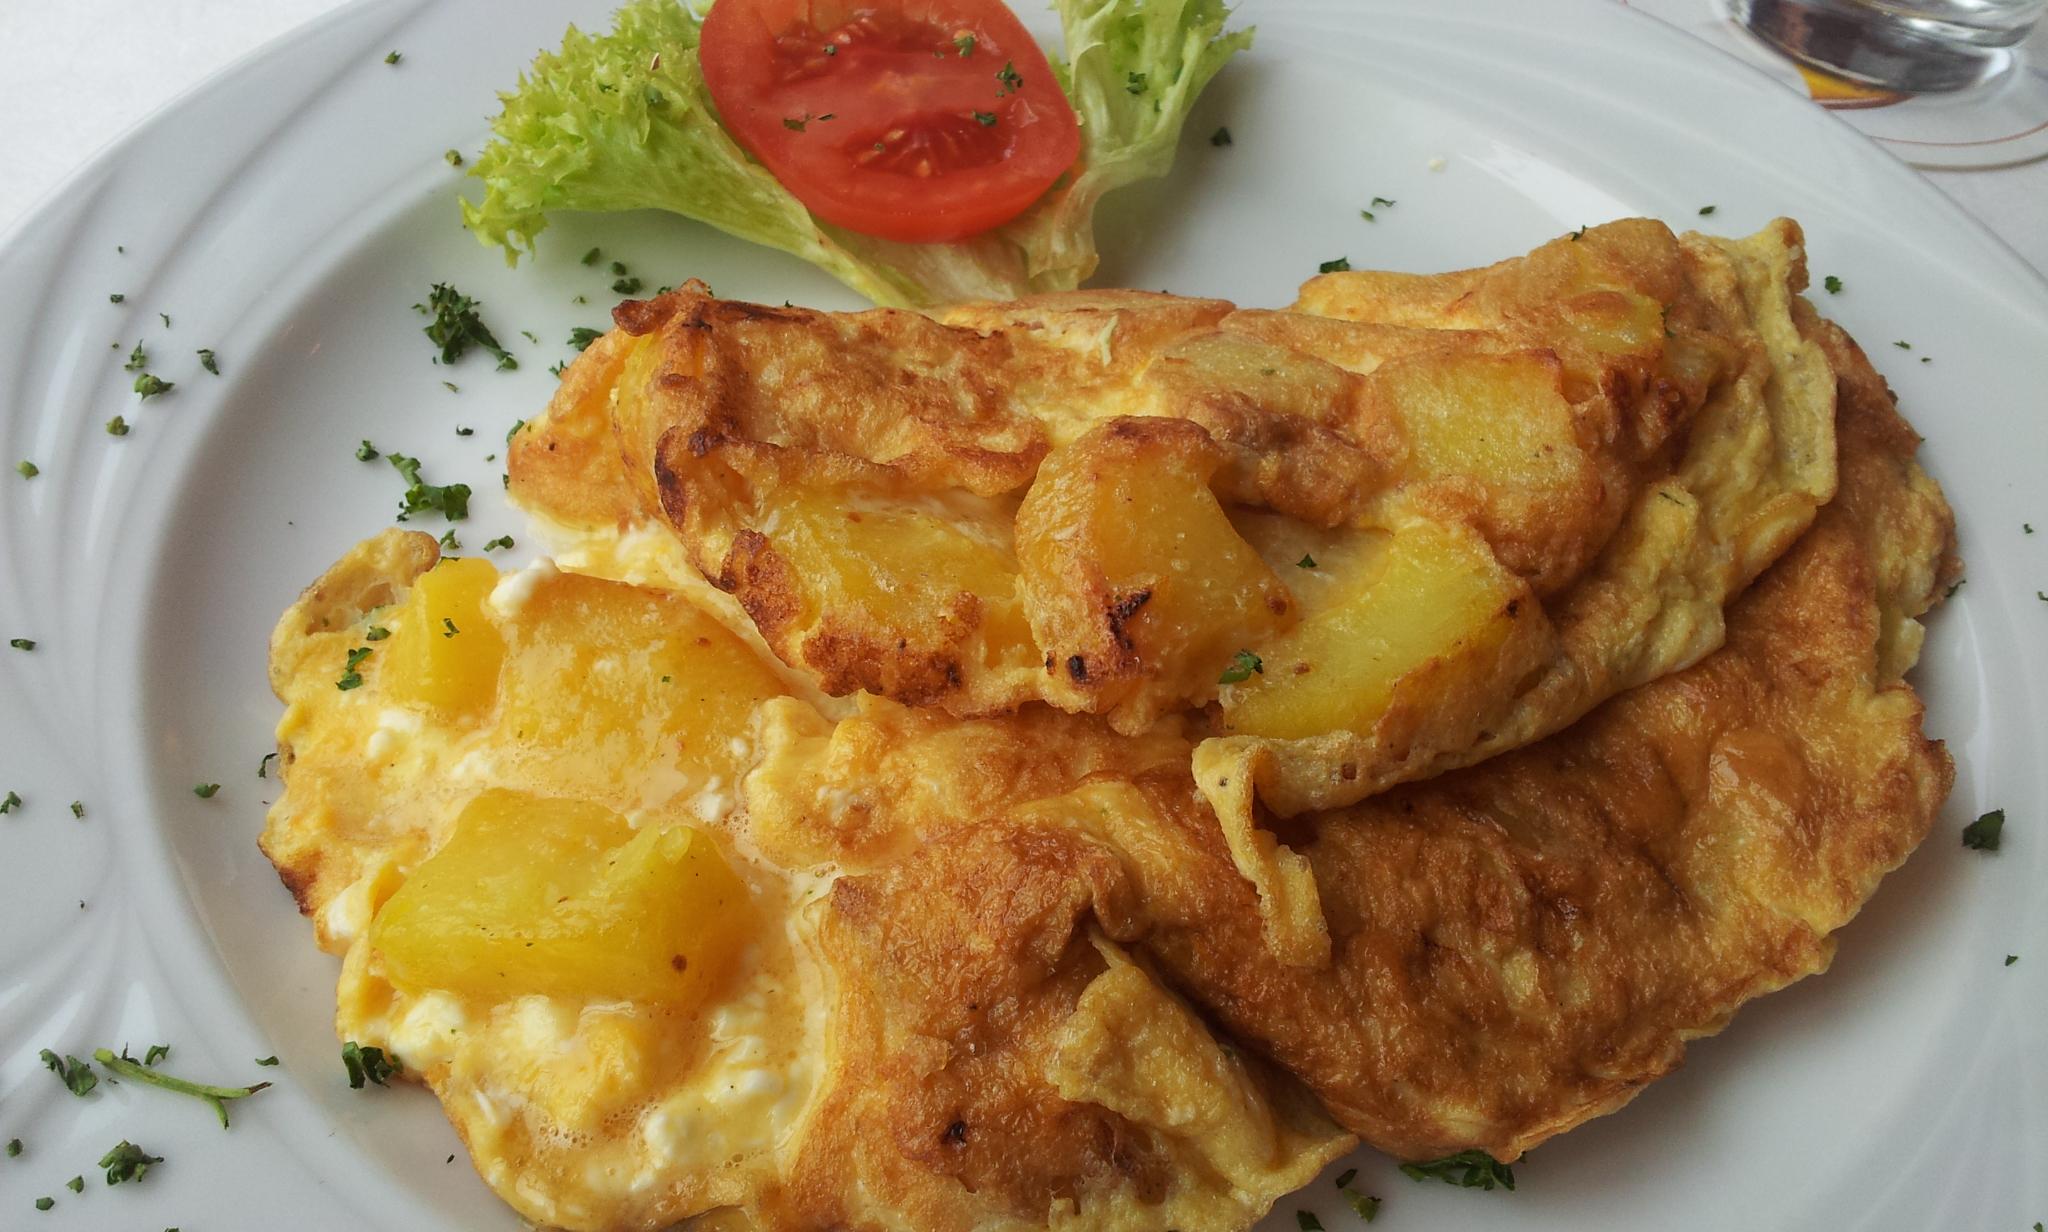 http://foodloader.net/Holz_2013-03-23_Jugo_Omelette.jpg